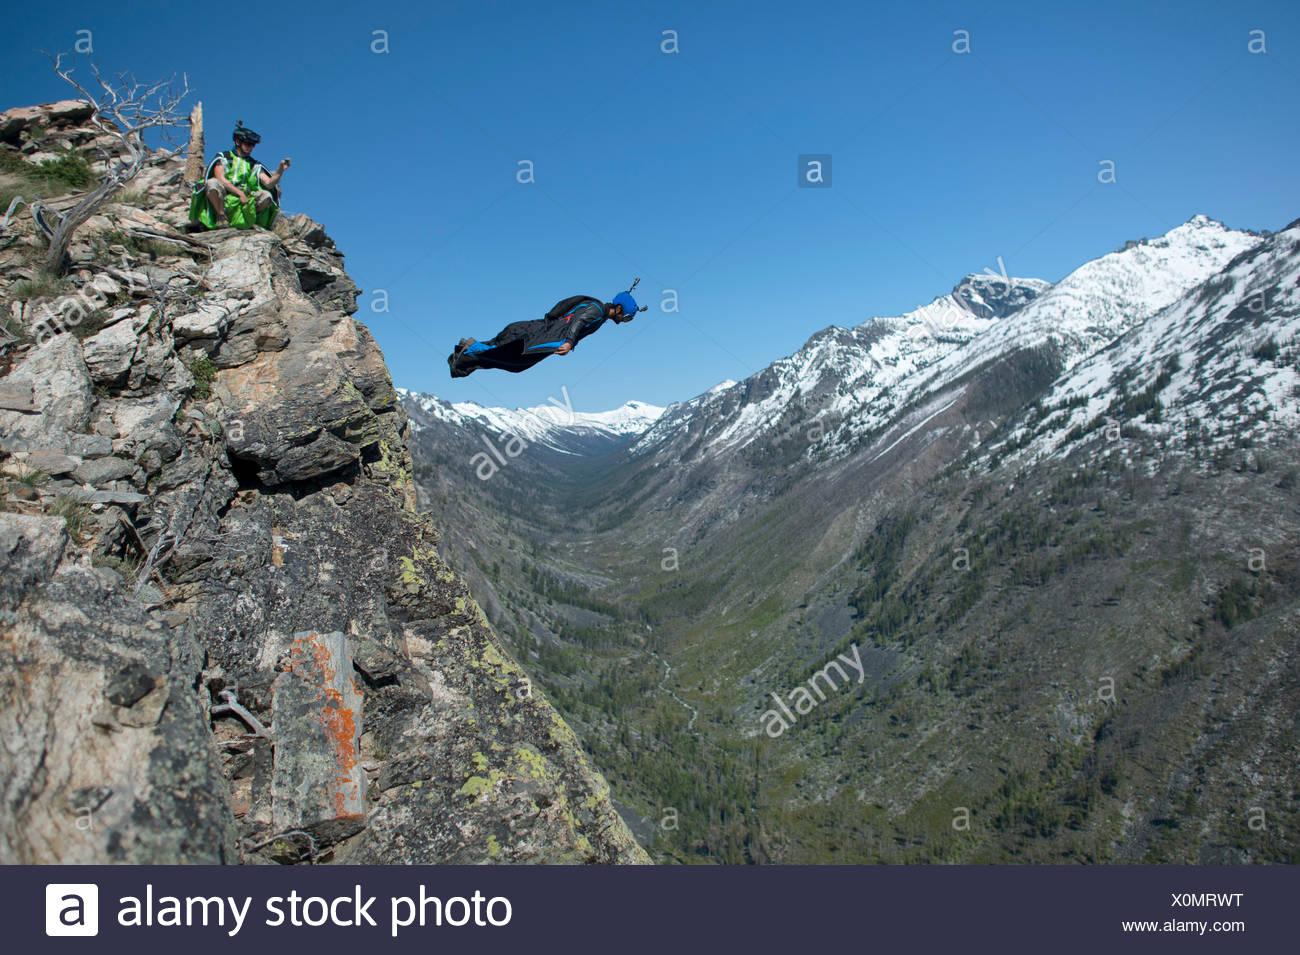 A wingsuit pilot jumps for a mountain proximity flight. - Stock Image